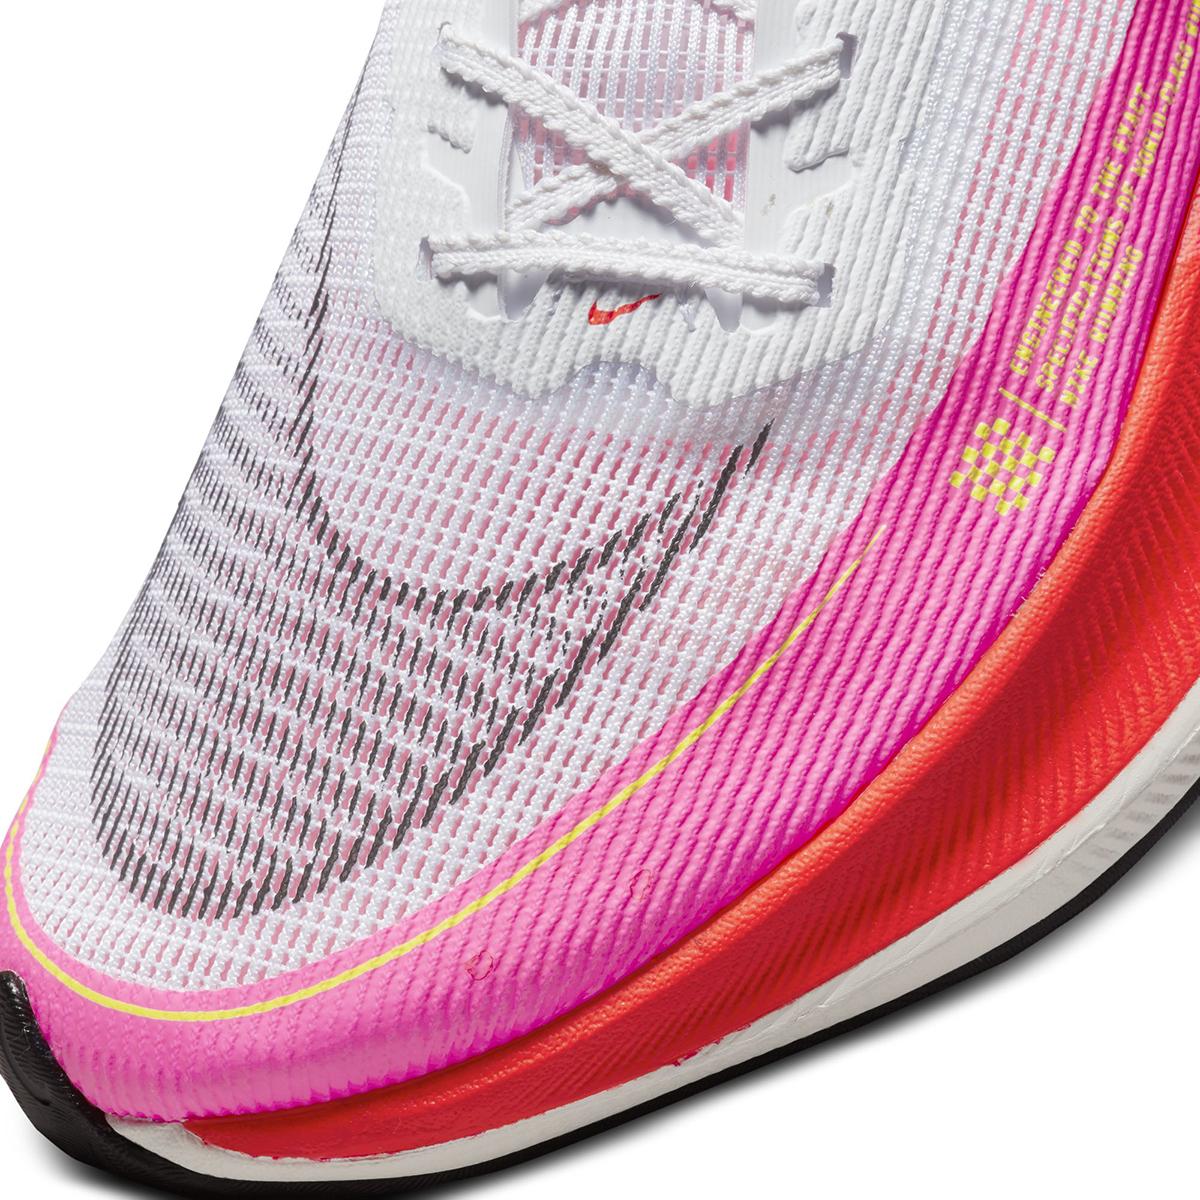 Men's Nike ZoomX Vaporfly Next% 2 Running Shoe - Color: Rawdacious - Size: 6 - Width: Regular, Rawdacious, large, image 7